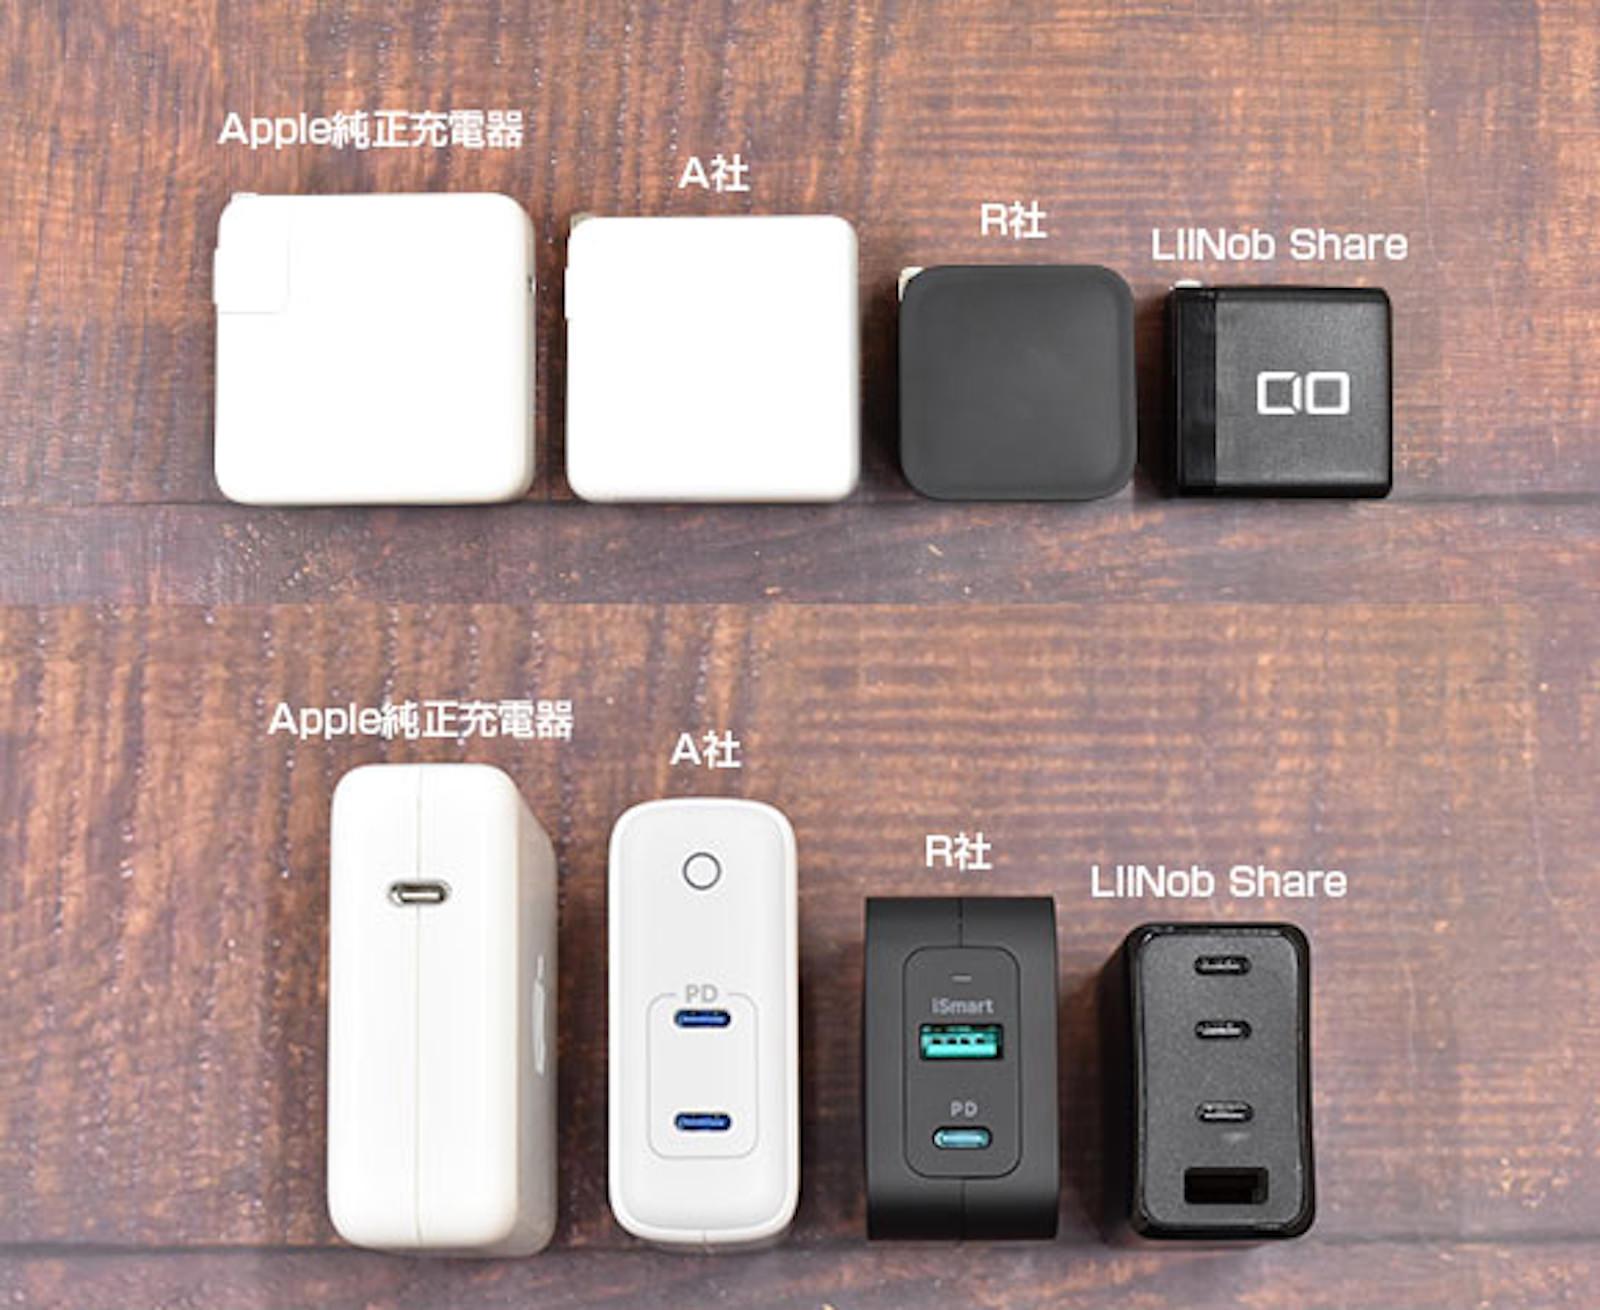 LilNob-Share-GaN-65W-charger-4.jpg